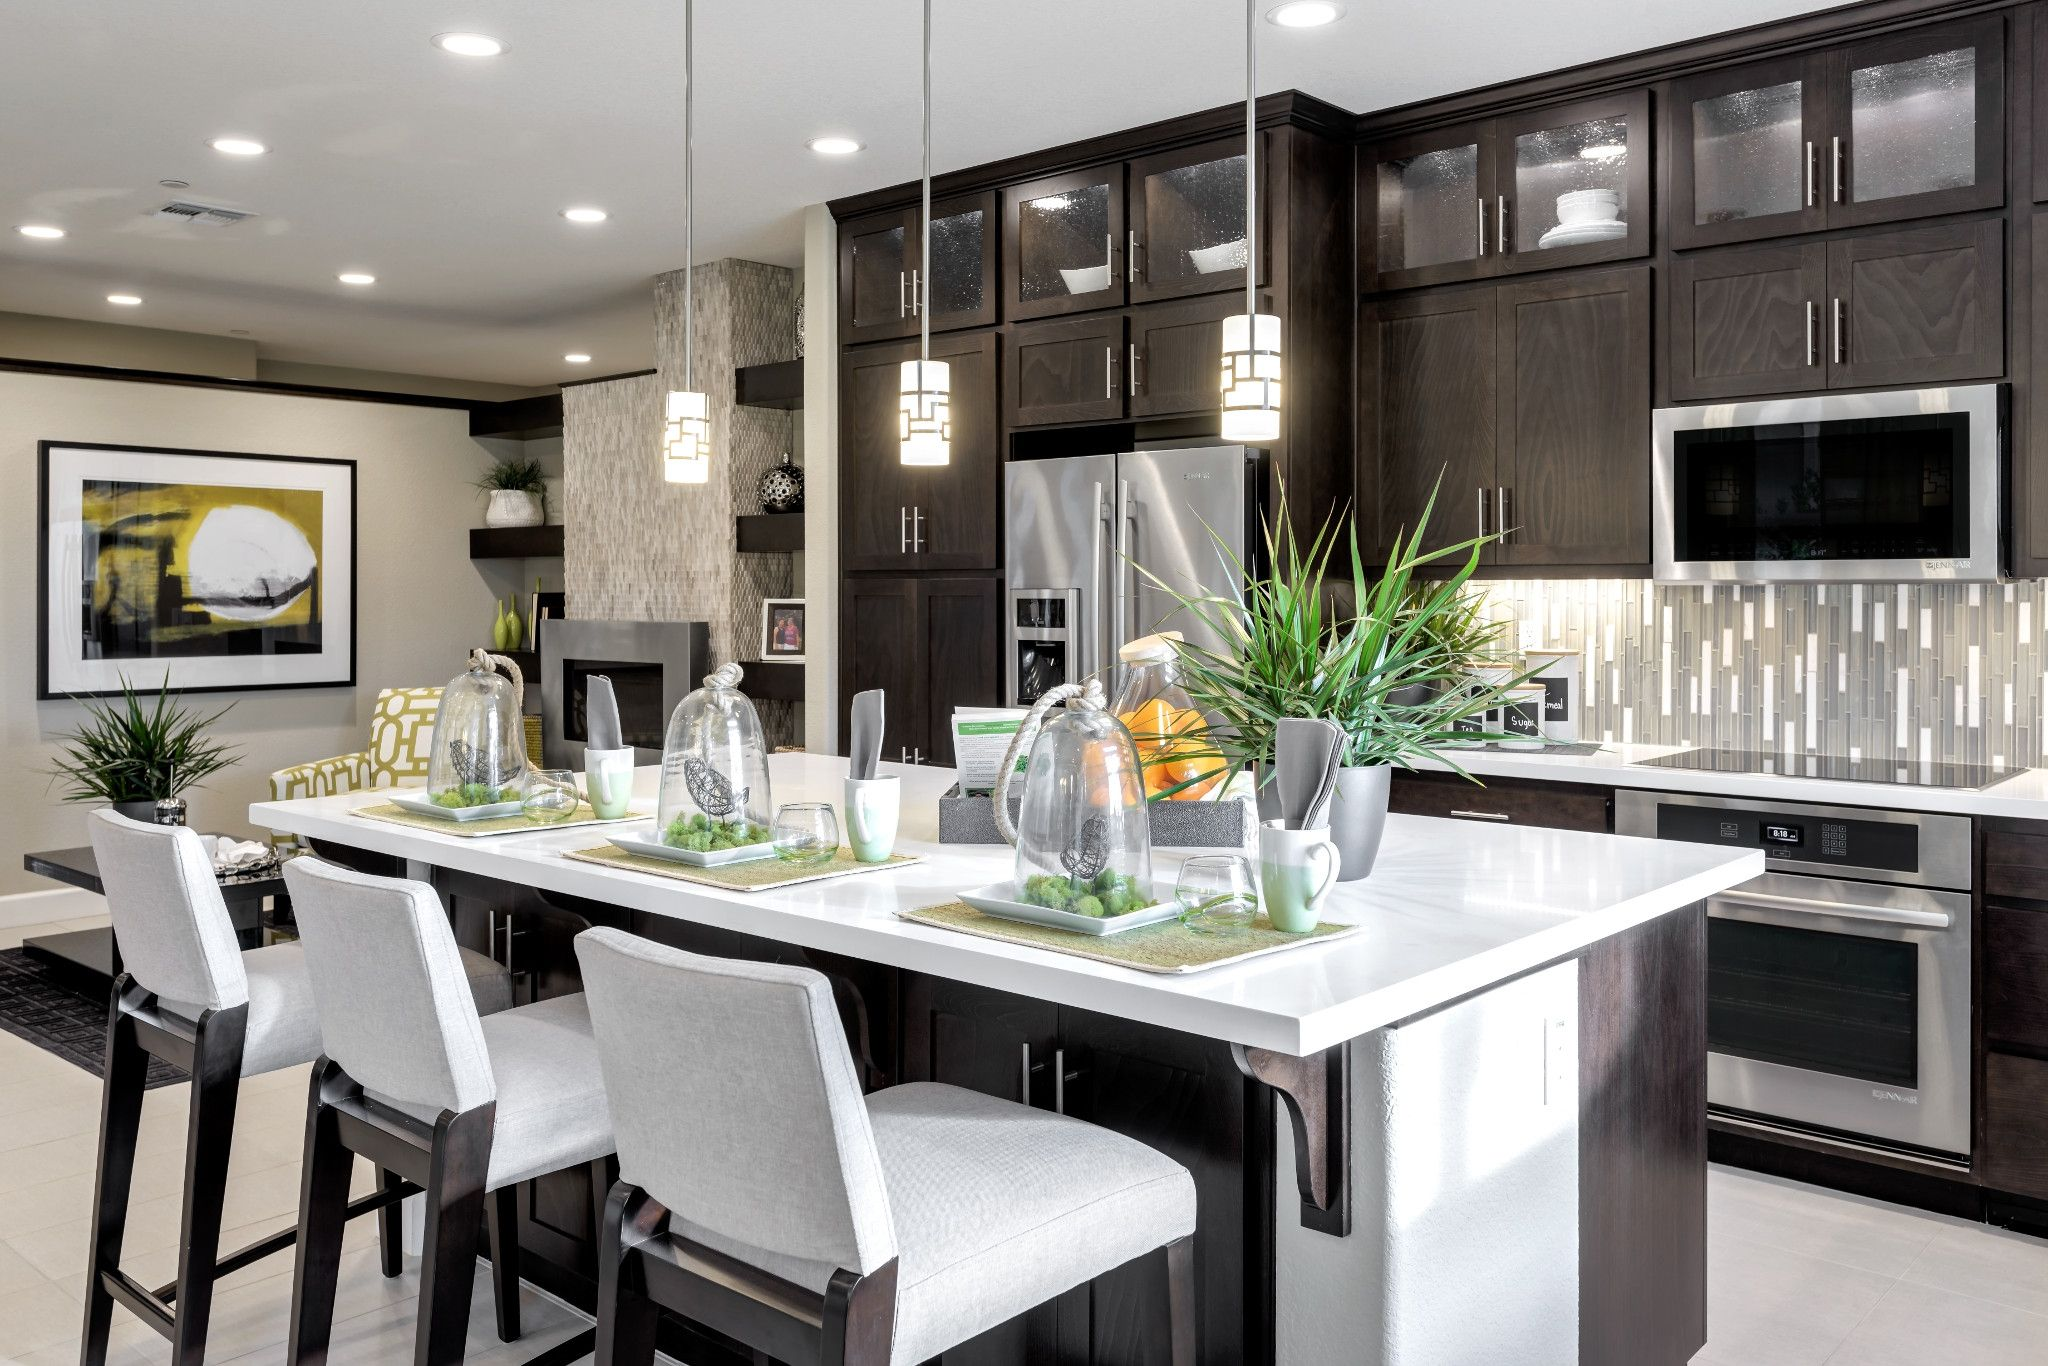 Kitchen-in-Rejuvenate-at-Trilogy® at Rio Vista-in-Rio Vista